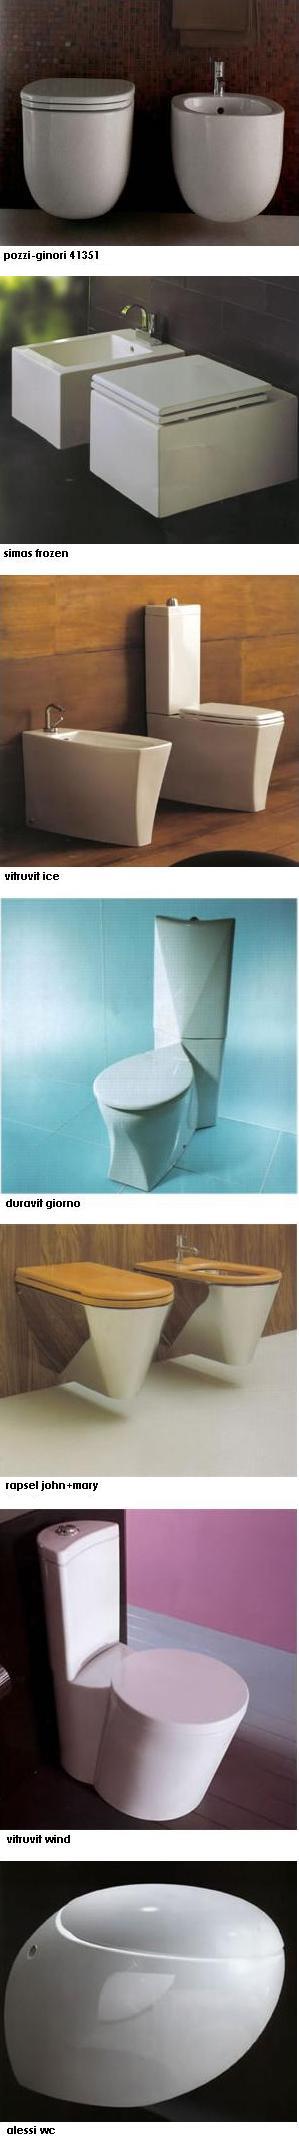 european toilet design models European Toilet Design   the latest trends